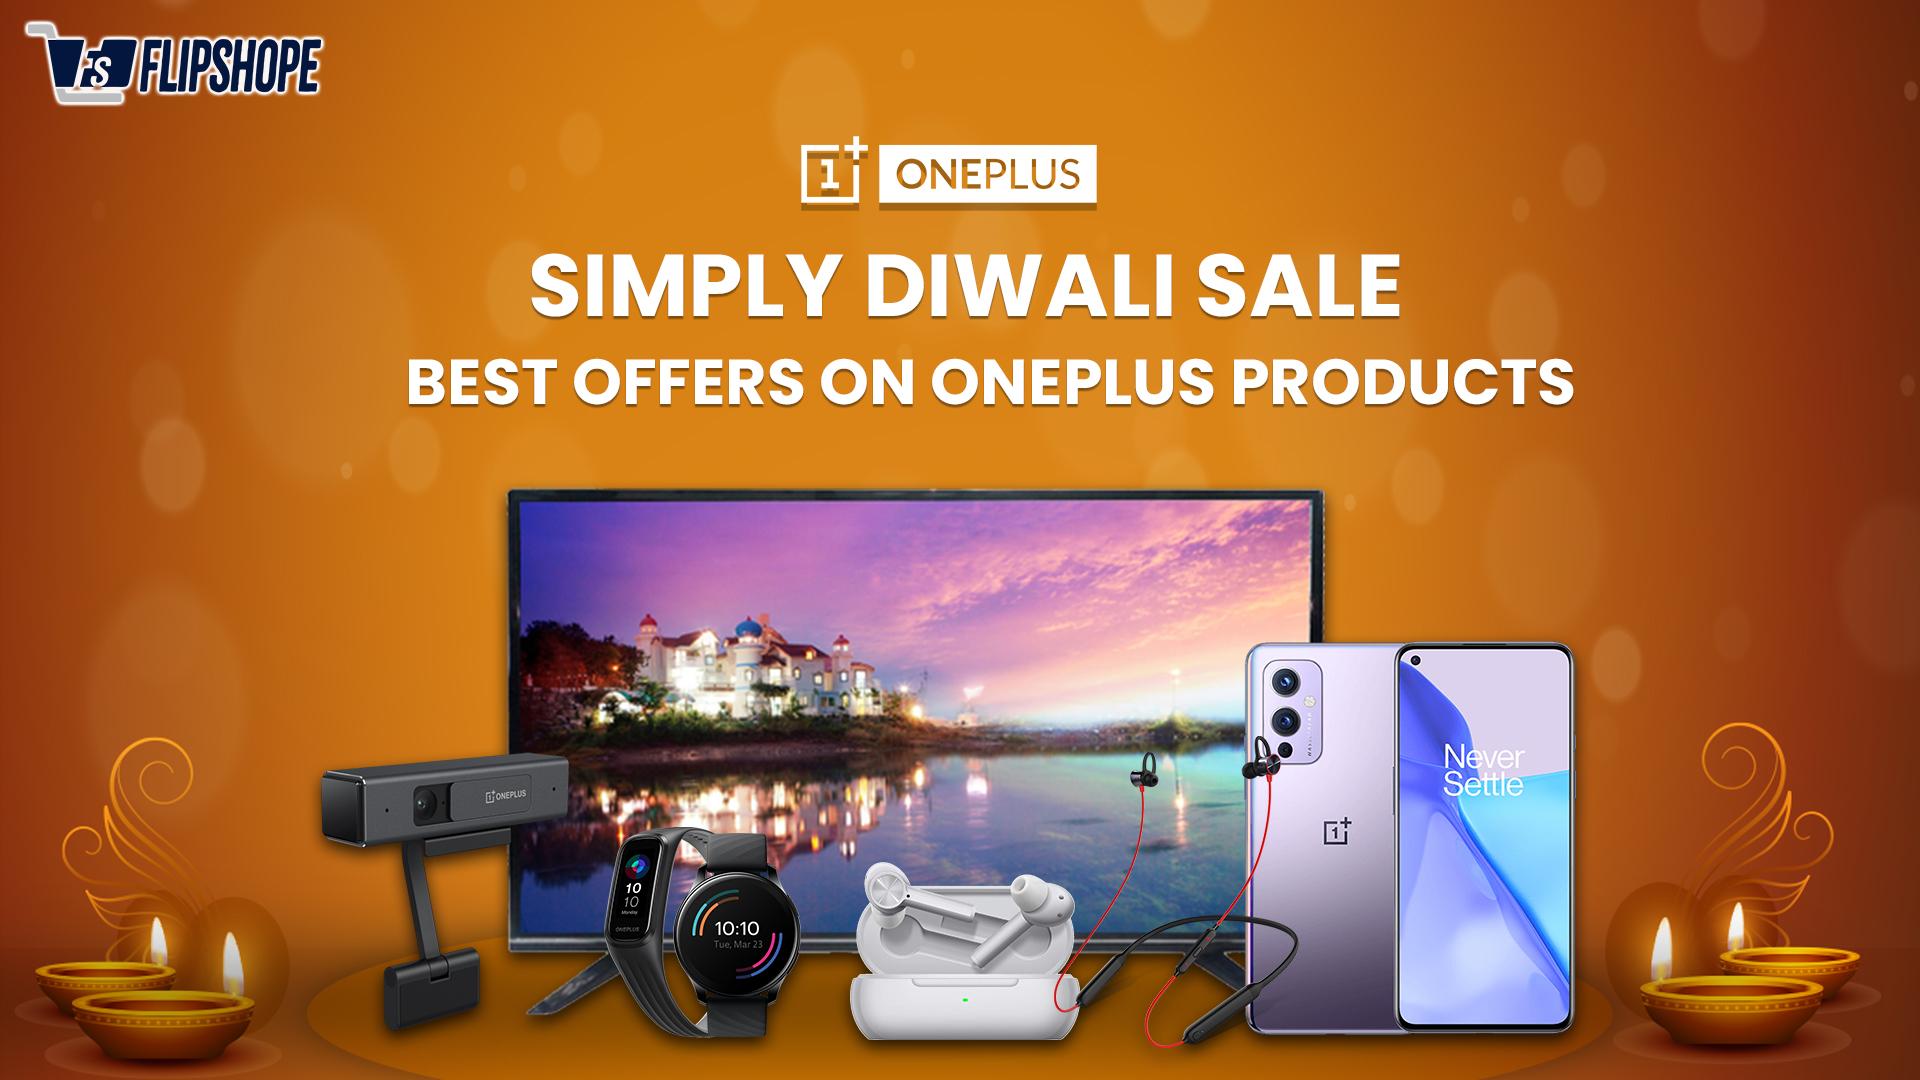 oneplus simply diwali sale